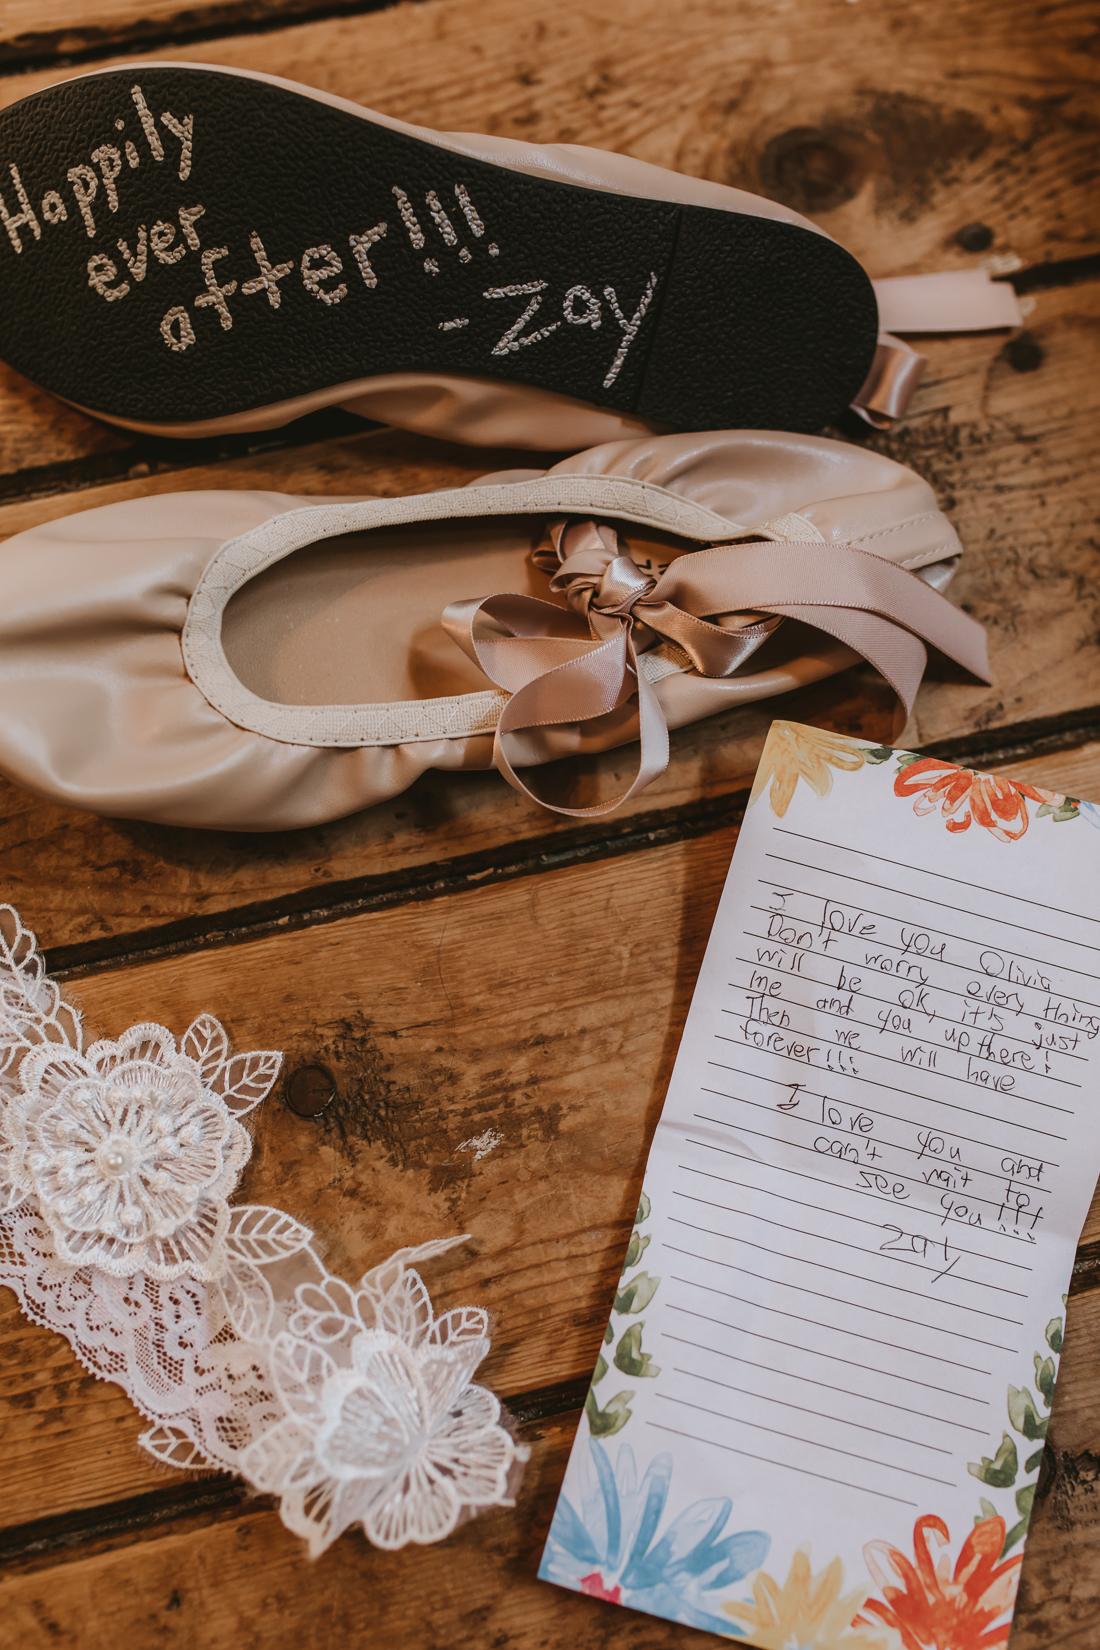 olivia_zay_wedding_09_2018-8581.jpg